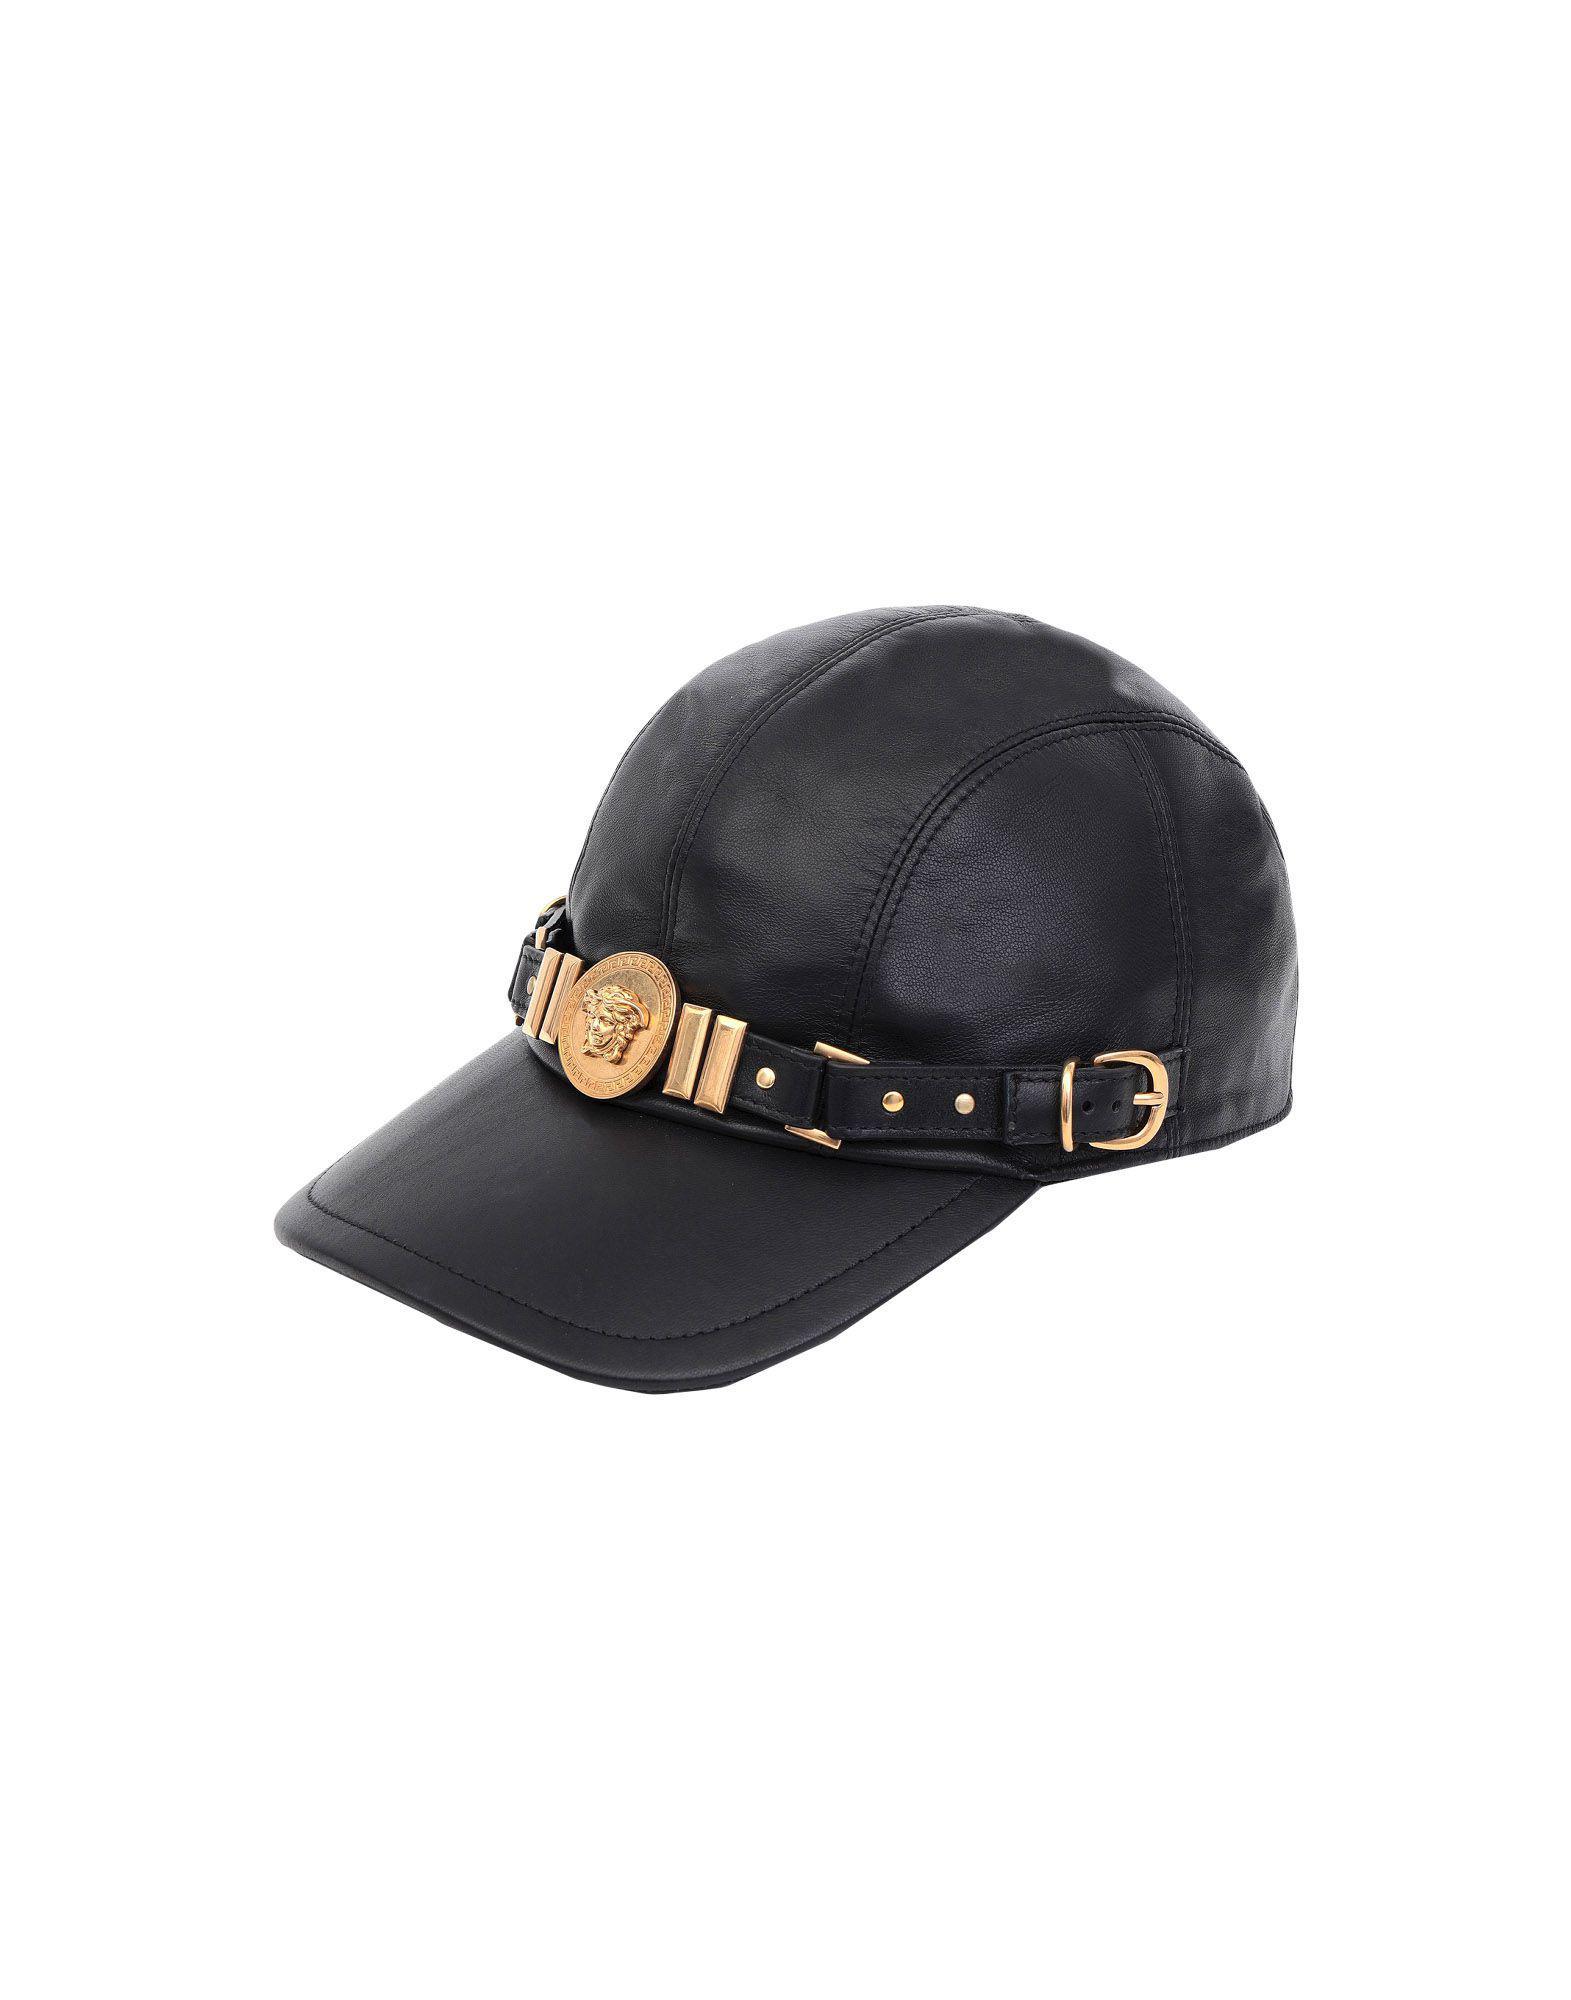 65e01d44 Lyst - Versace Hat in Black